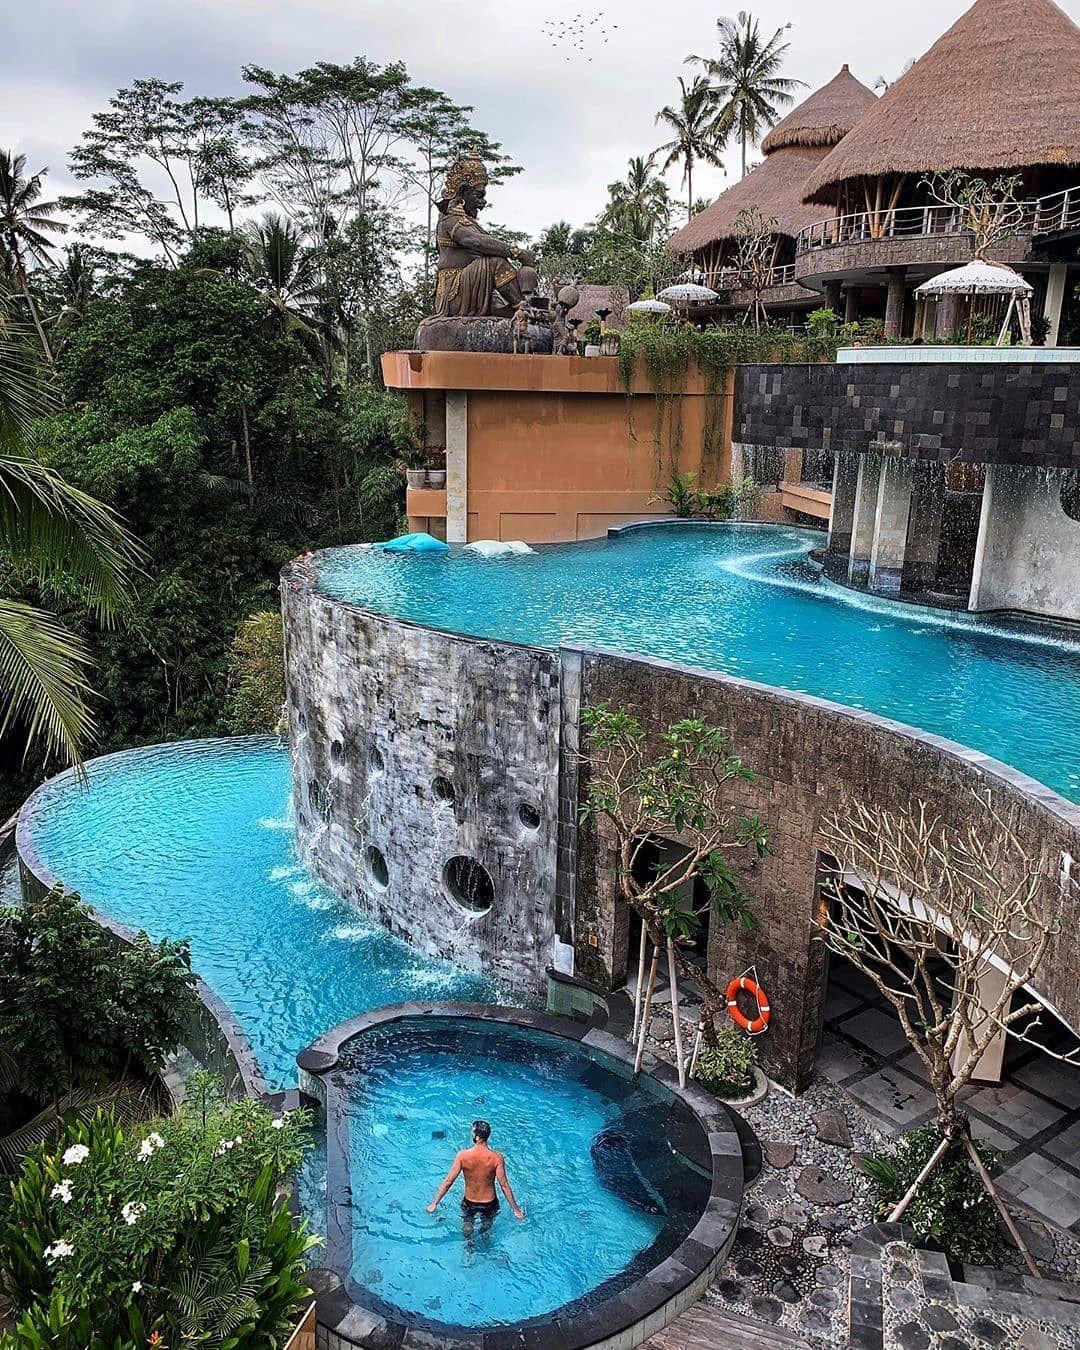 #travel #travels #travelblog #travelblogger #vacation